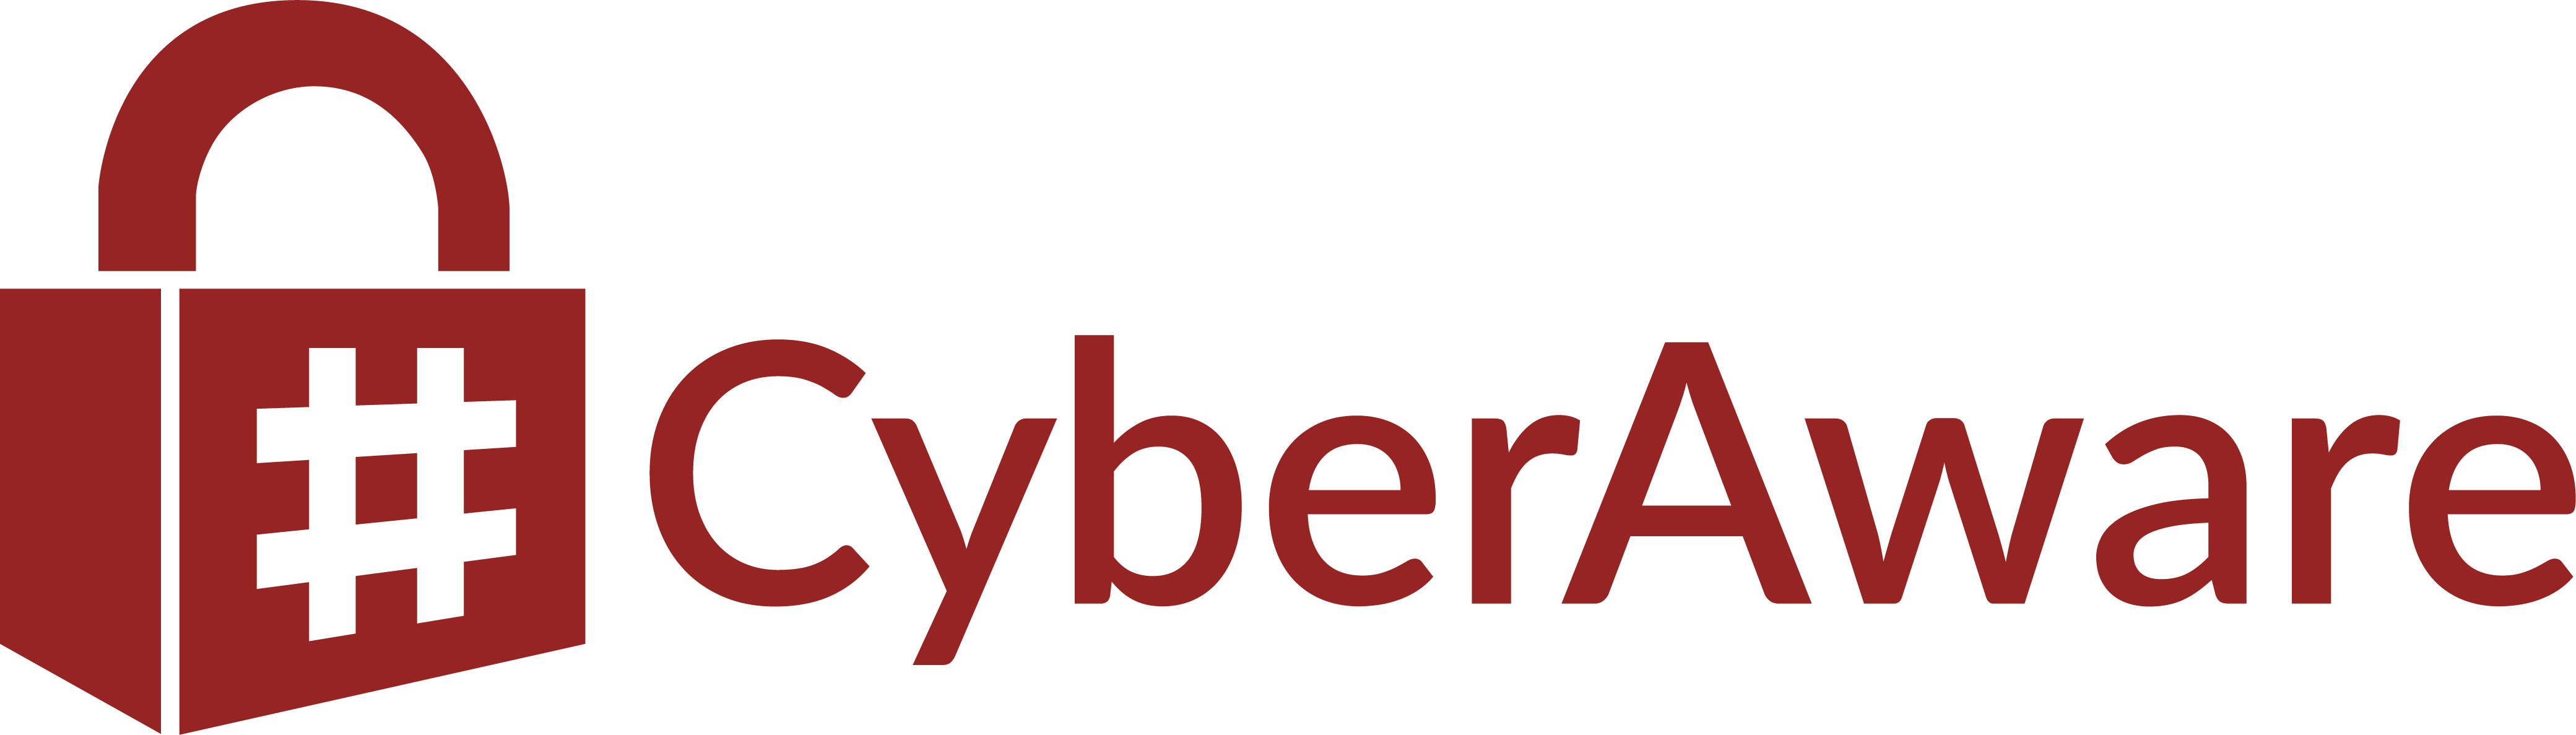 #CyberAware